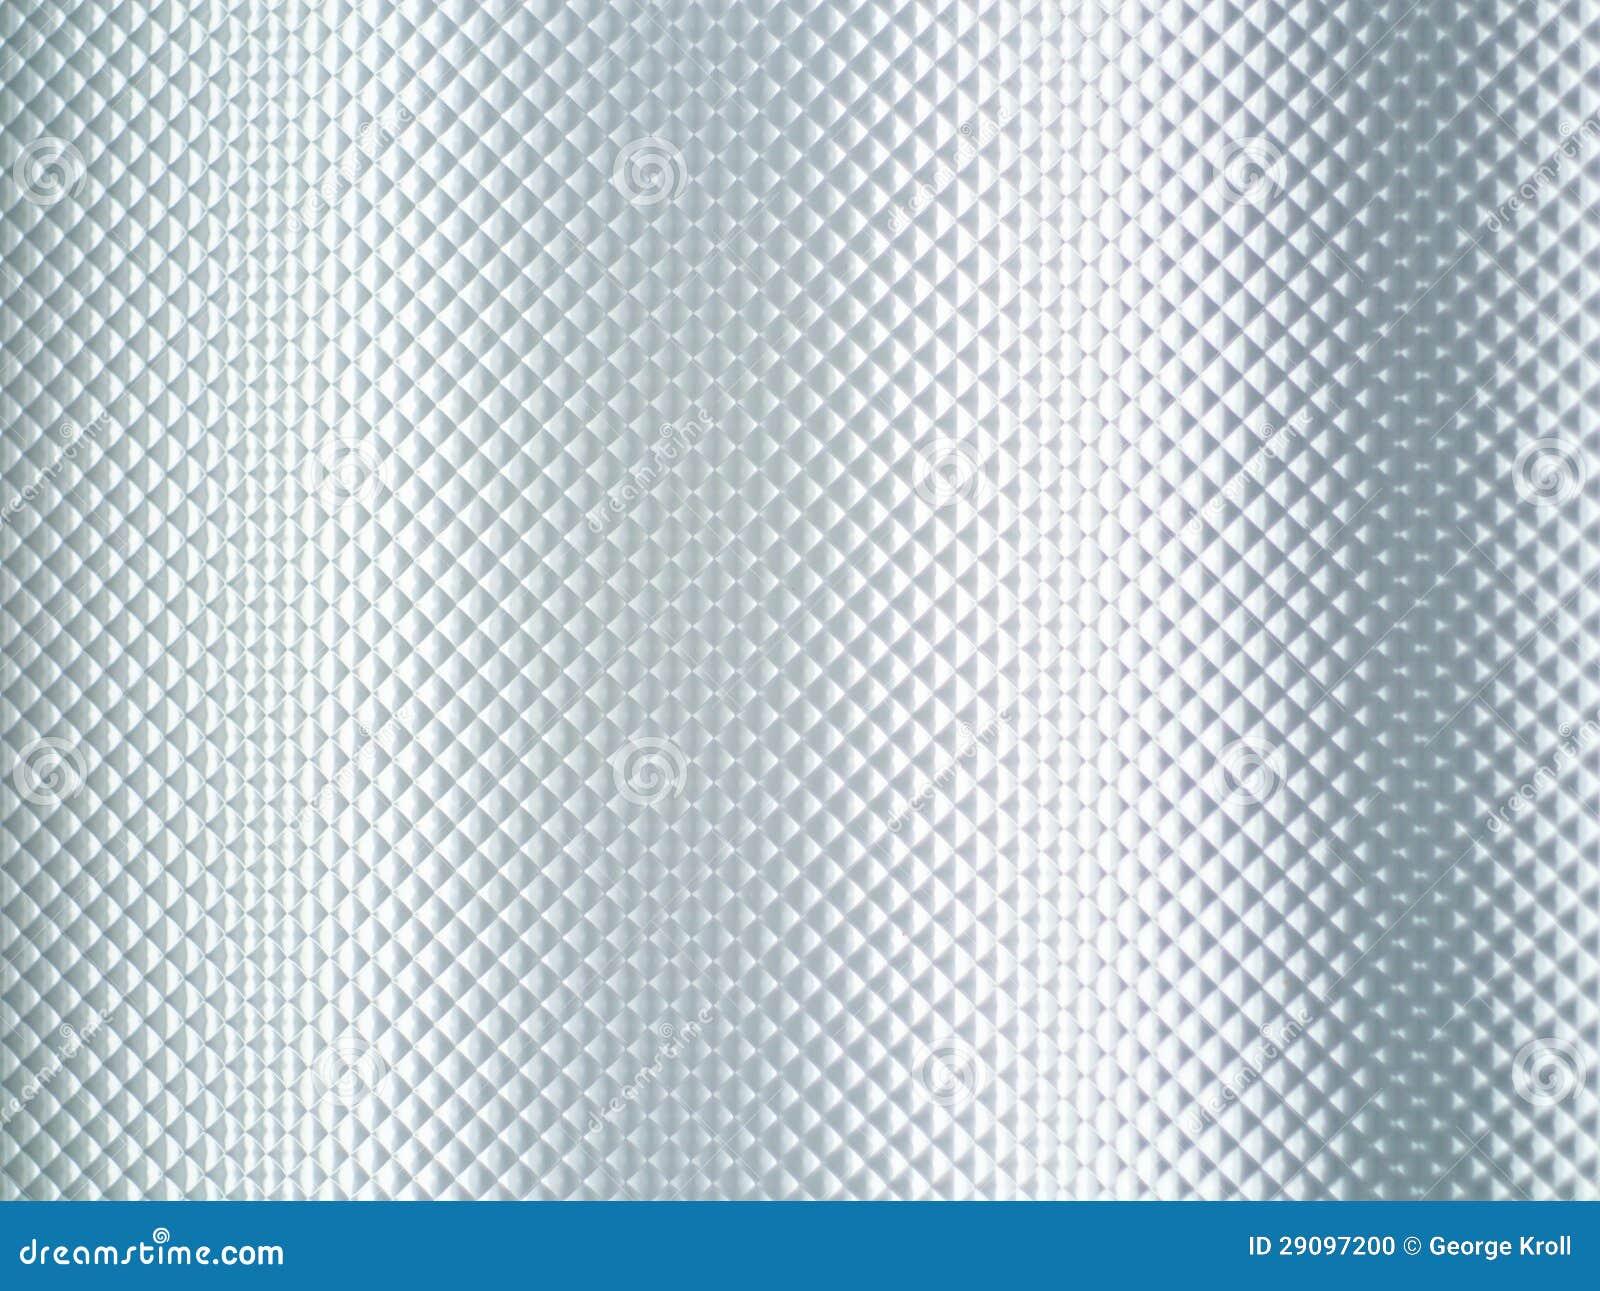 overhead lighting diffuser background texture stock photo image. Black Bedroom Furniture Sets. Home Design Ideas